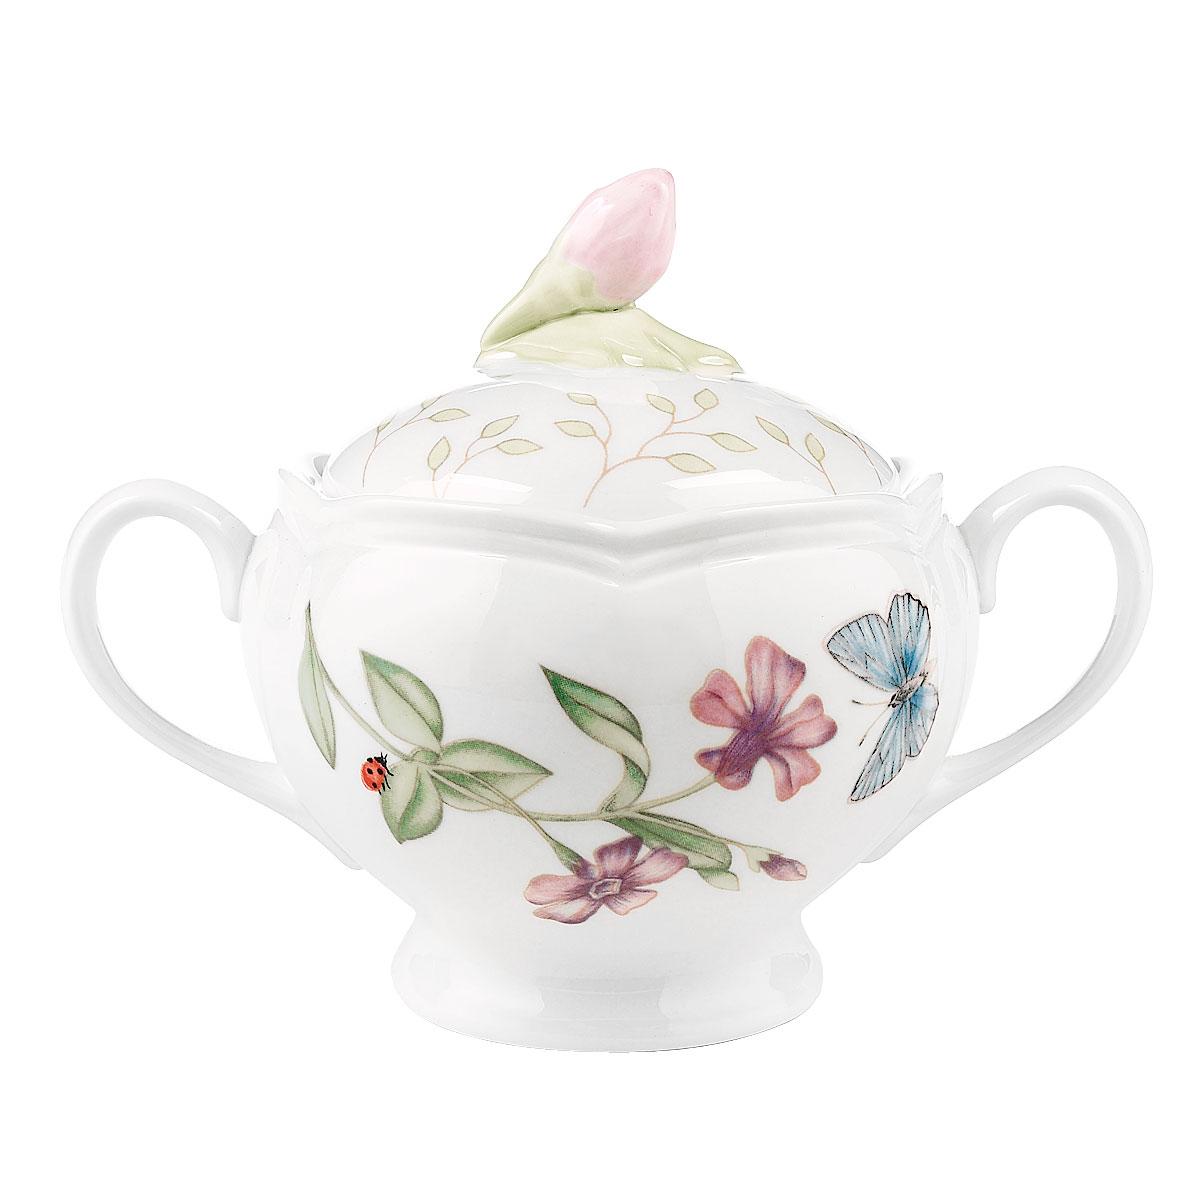 Lenox Butterfly Meadow Dinnerware Sugar Bowl With Lid